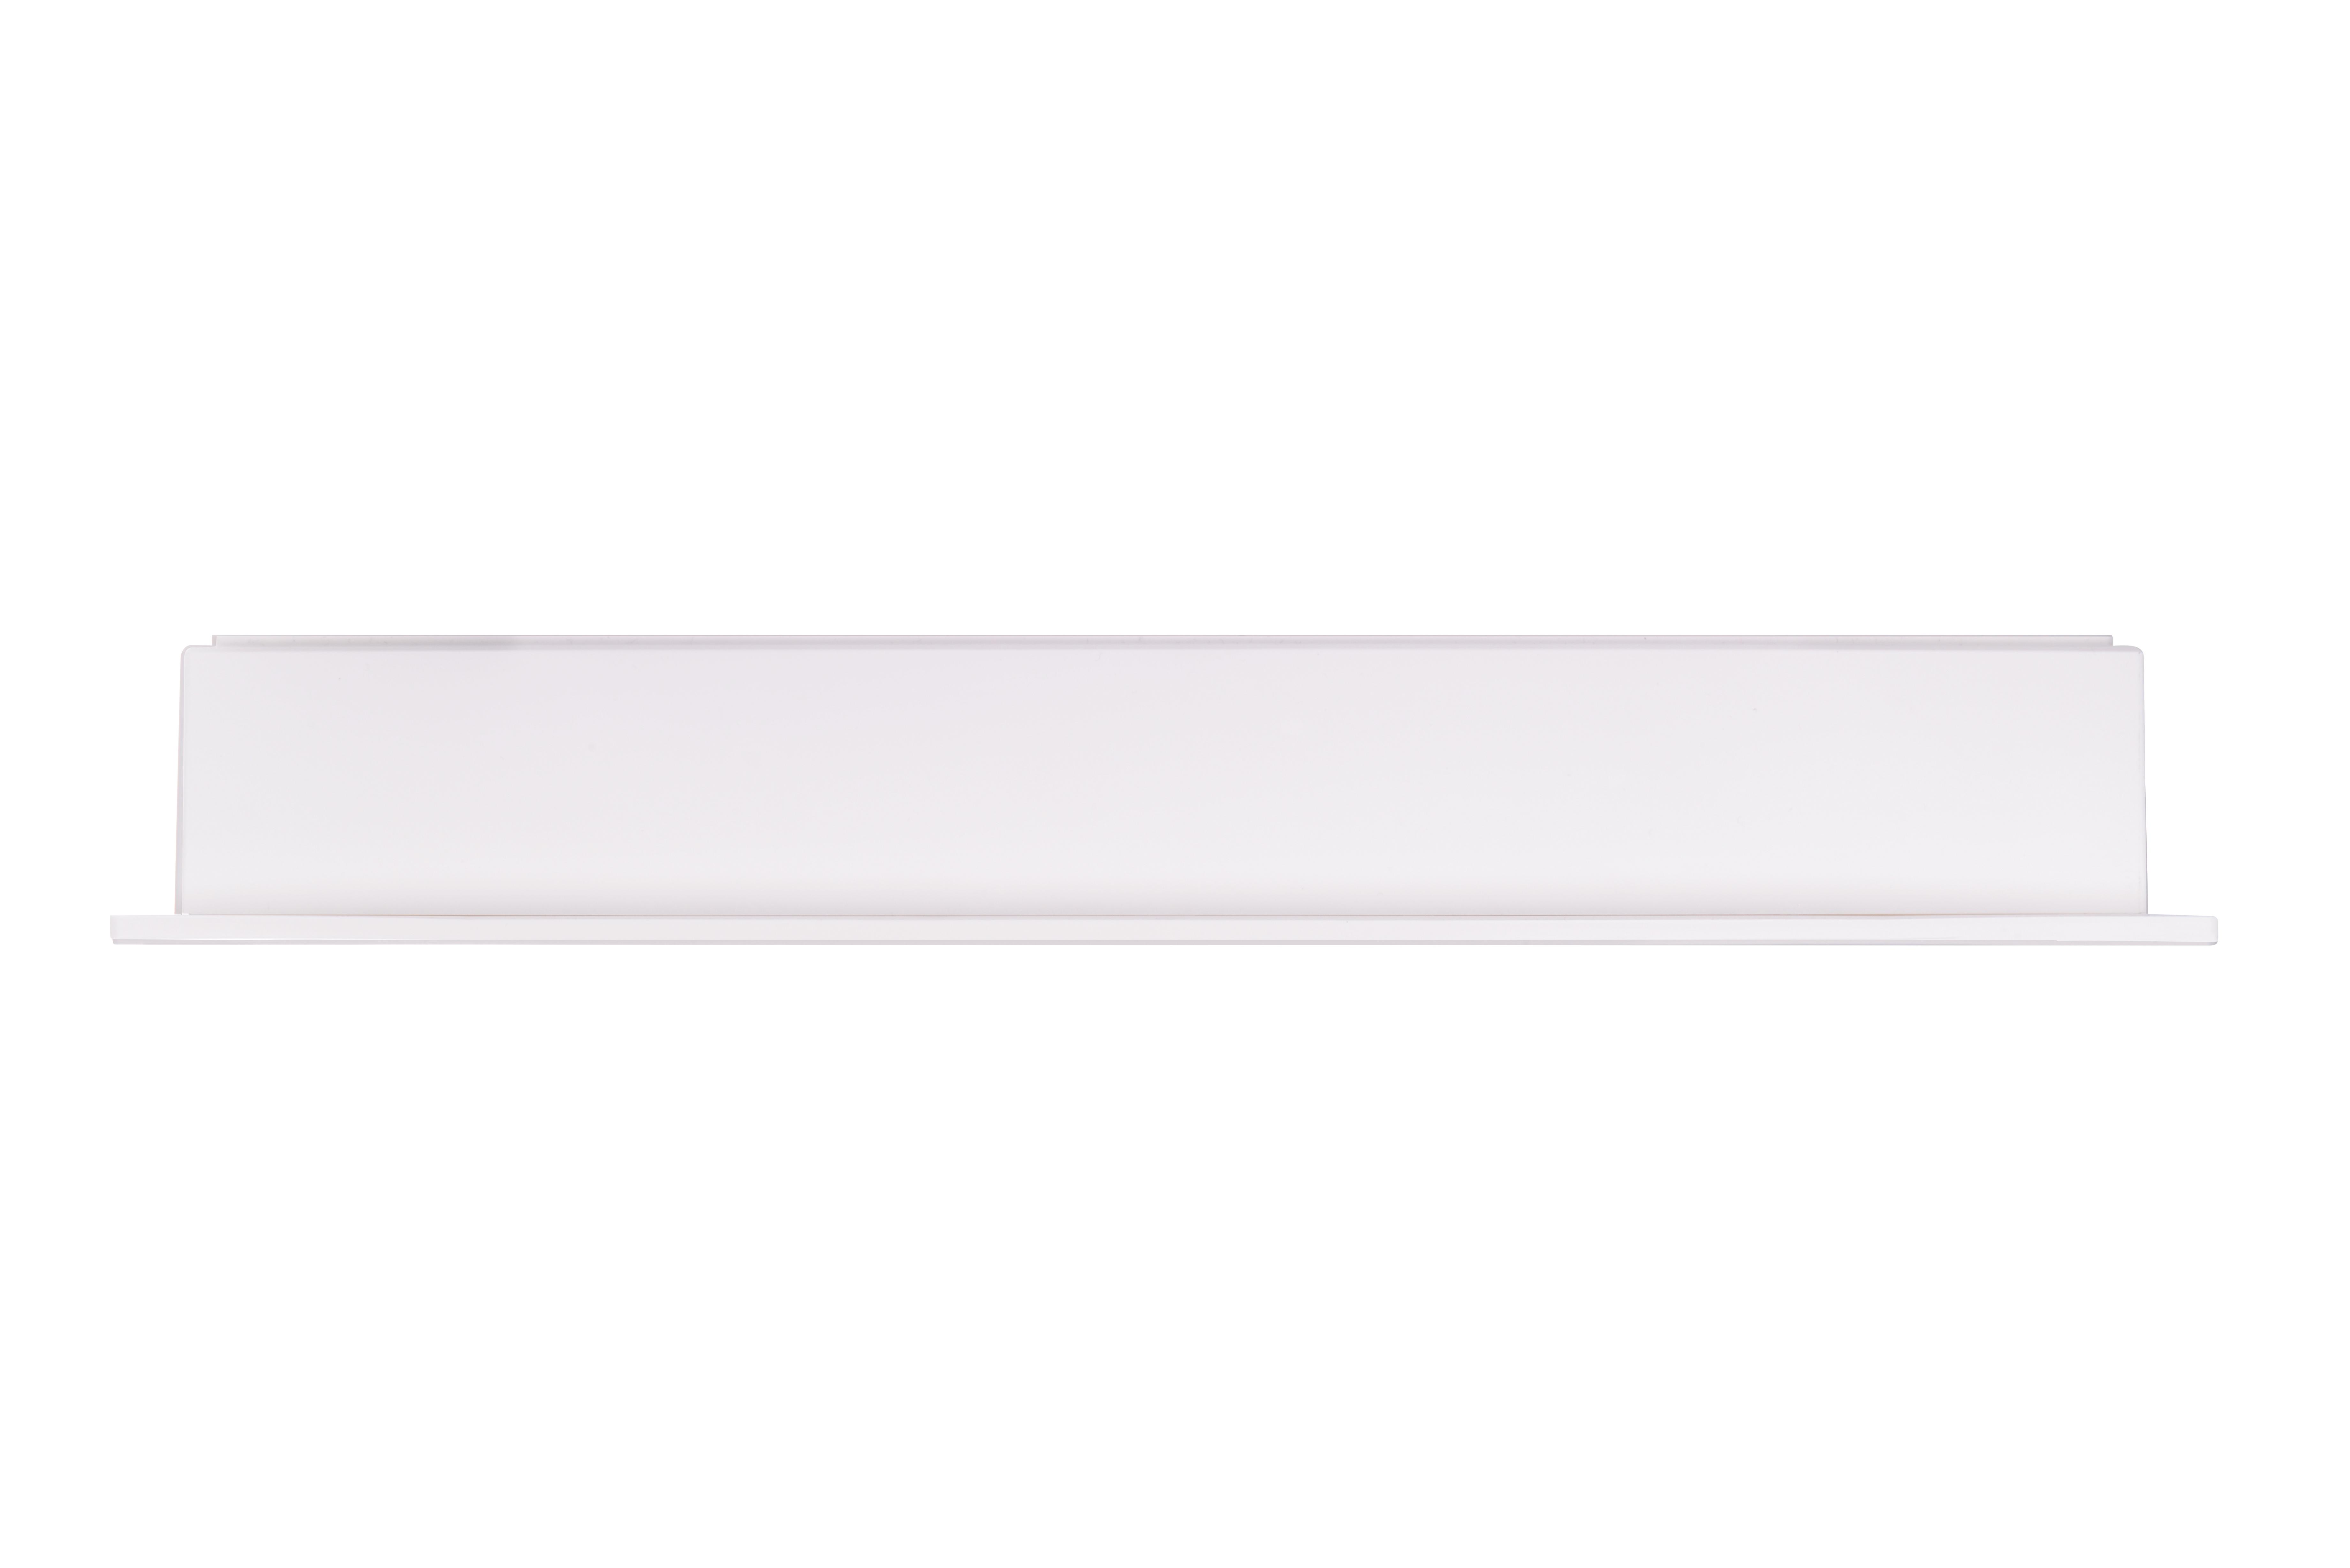 Lampa emergenta led Intelight 94554   3h mentinut test automat 5